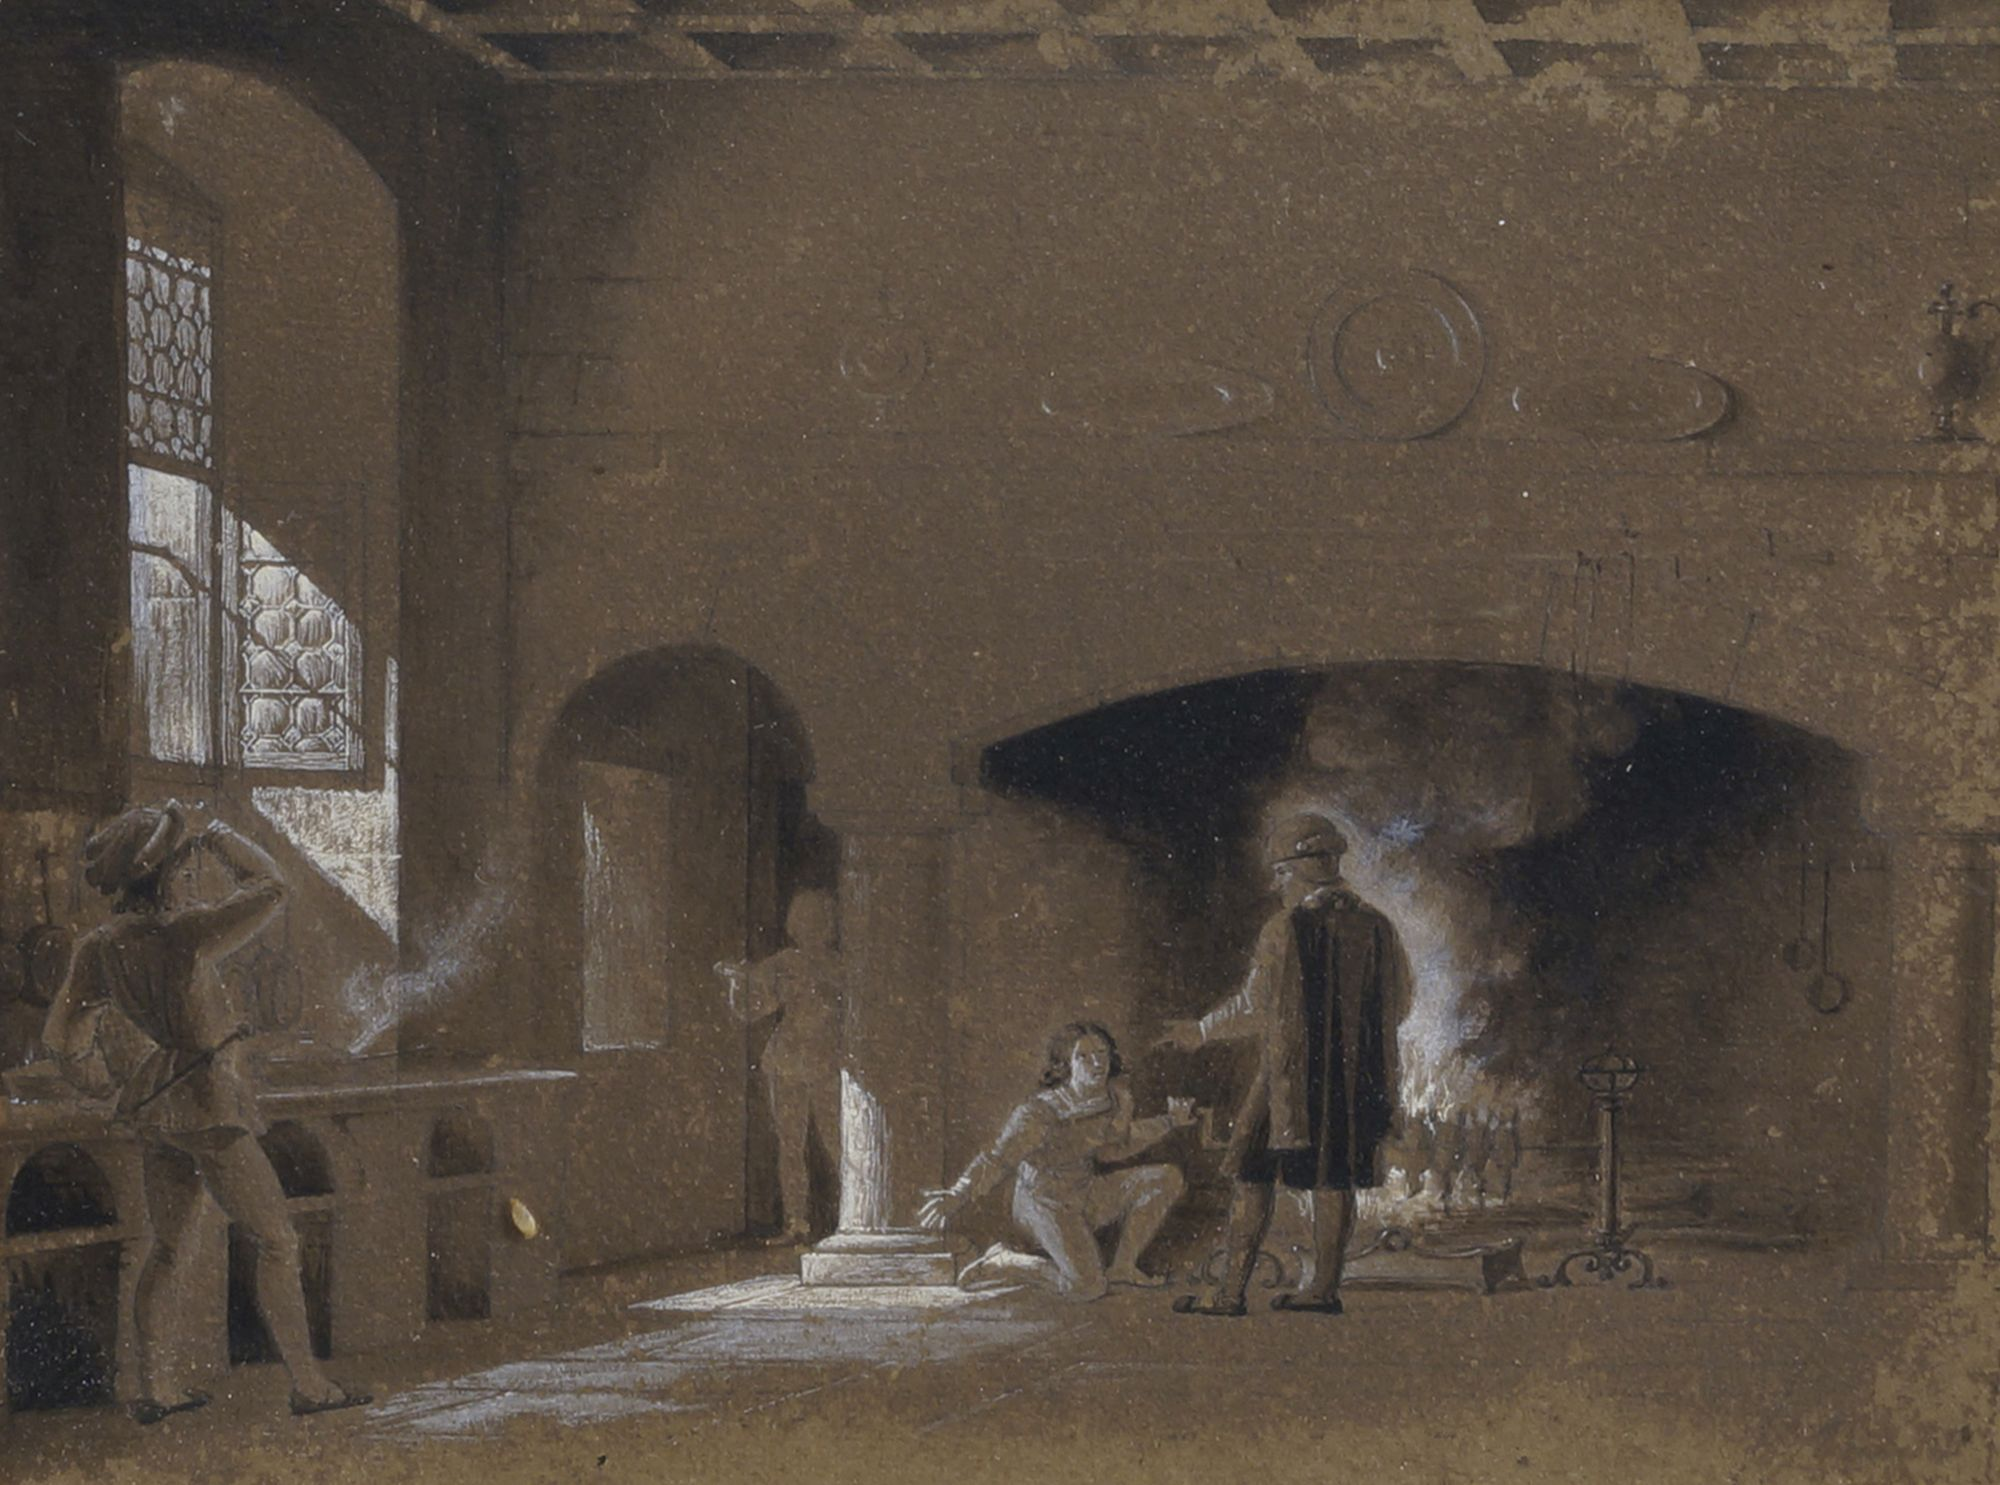 Lot 134 - Fleury François Richard, French 1777-1852- Louis XI dans ses cuisines, 1823; pencil and brush and